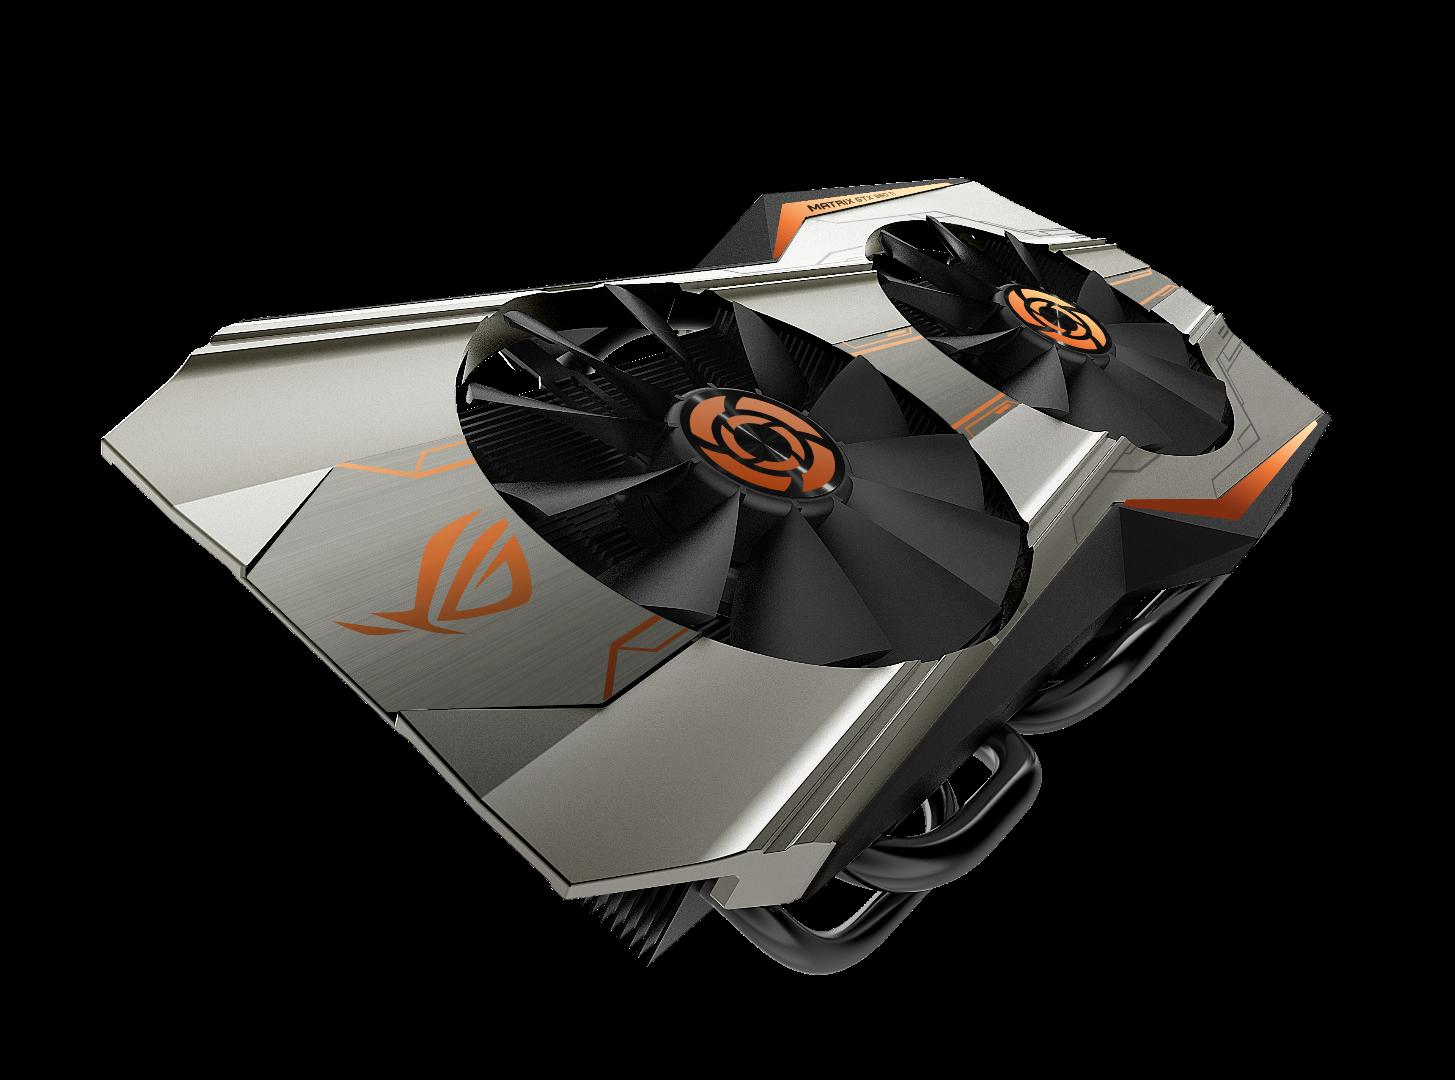 ASUS ROG MATRIX GTX 980 Ti Platinum Graphics Card Unveiled - New ROG Swift G-Sync Monitors ...